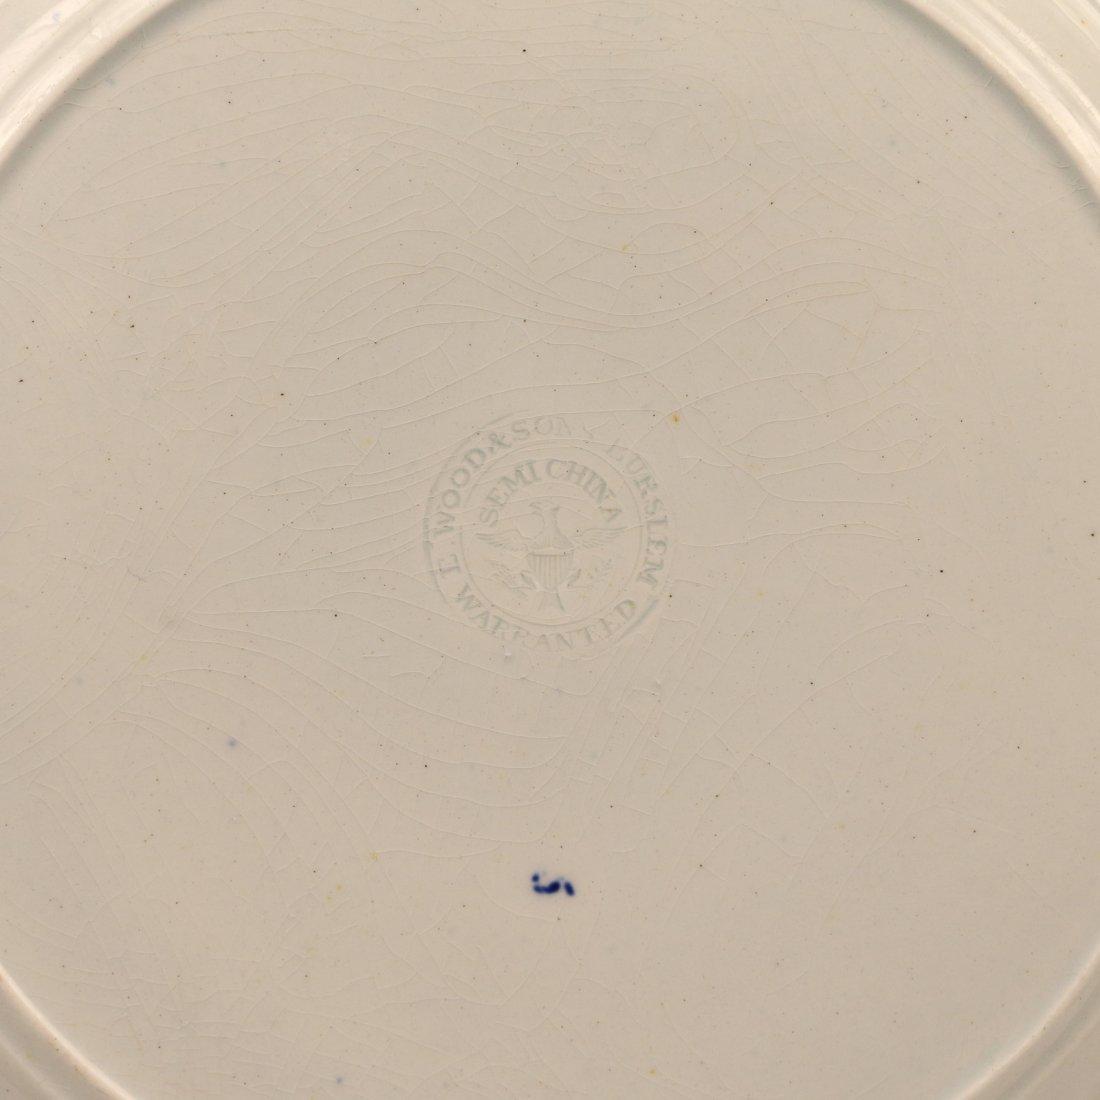 (2pc) DARK BLUE STAFFORDSHIRE HISTORIC PLATES - 6